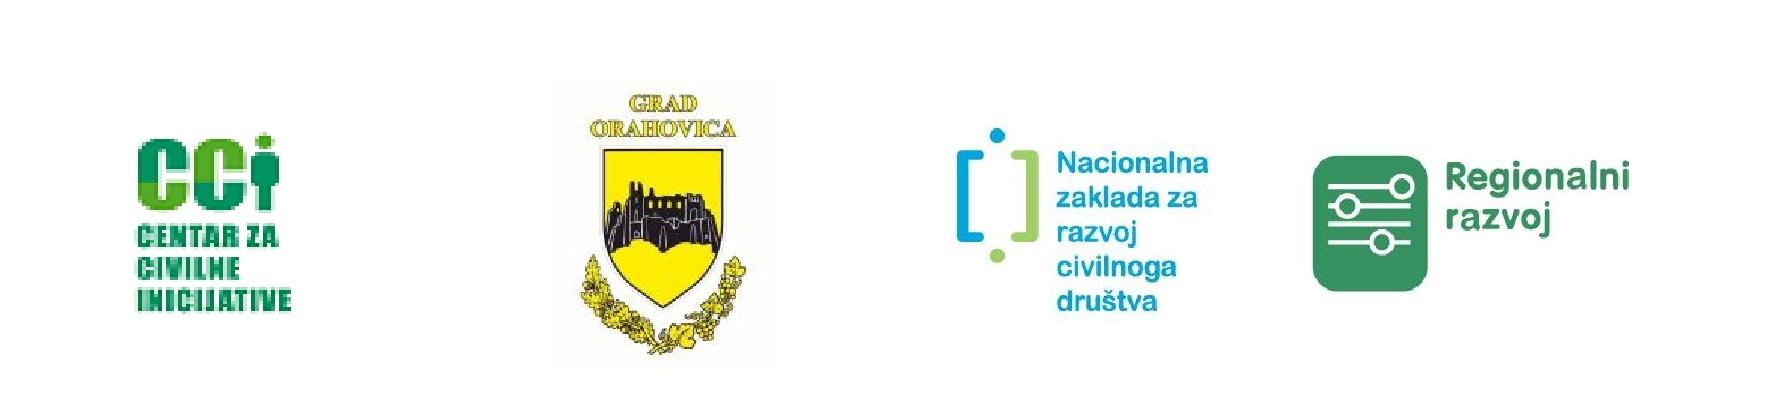 Poziv projekti Orahovica 22 3 2018 (005)